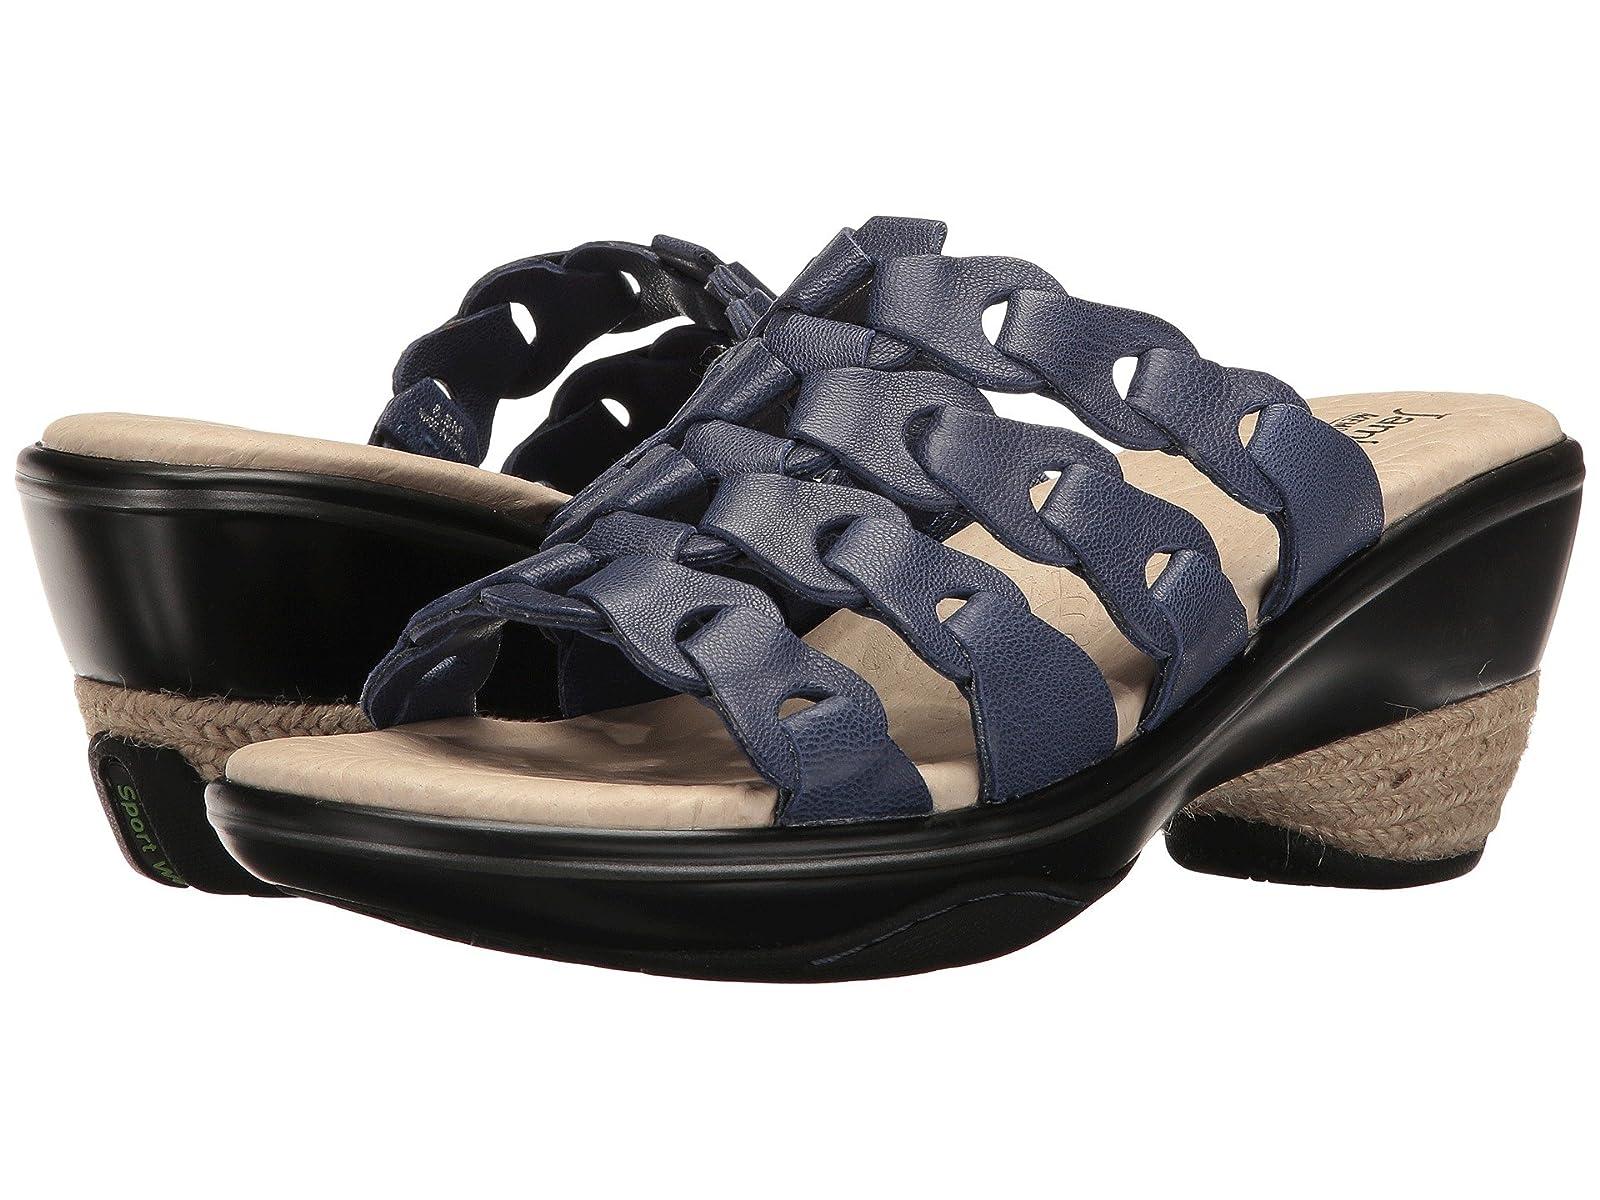 Jambu RomanceCheap and distinctive eye-catching shoes